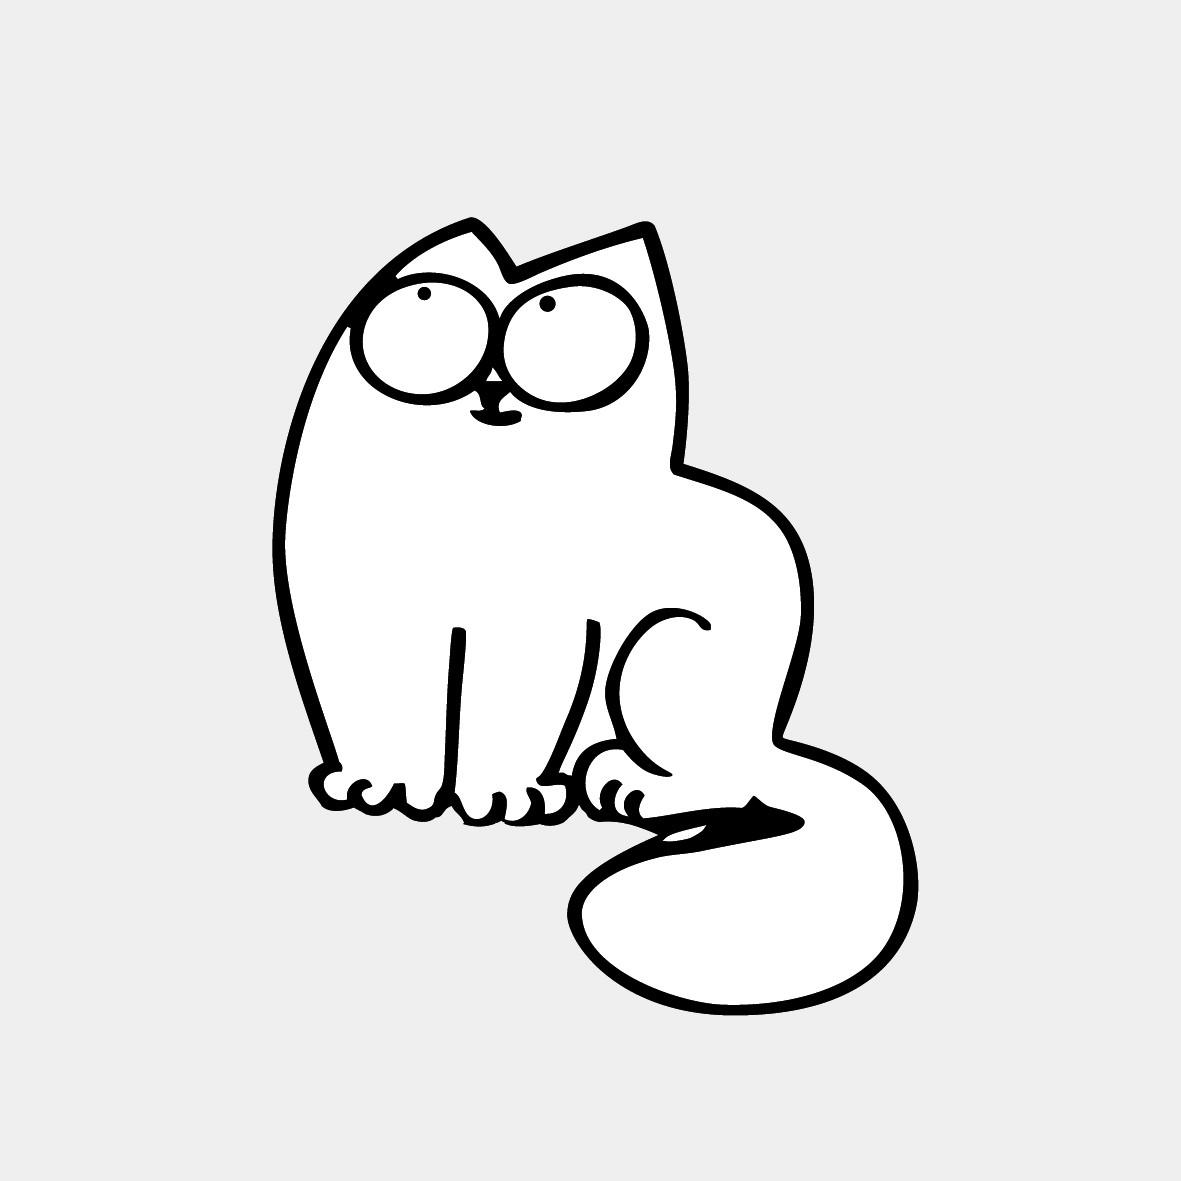 High Resolution Wallpaper | Simon's Cat 1181x1181 px